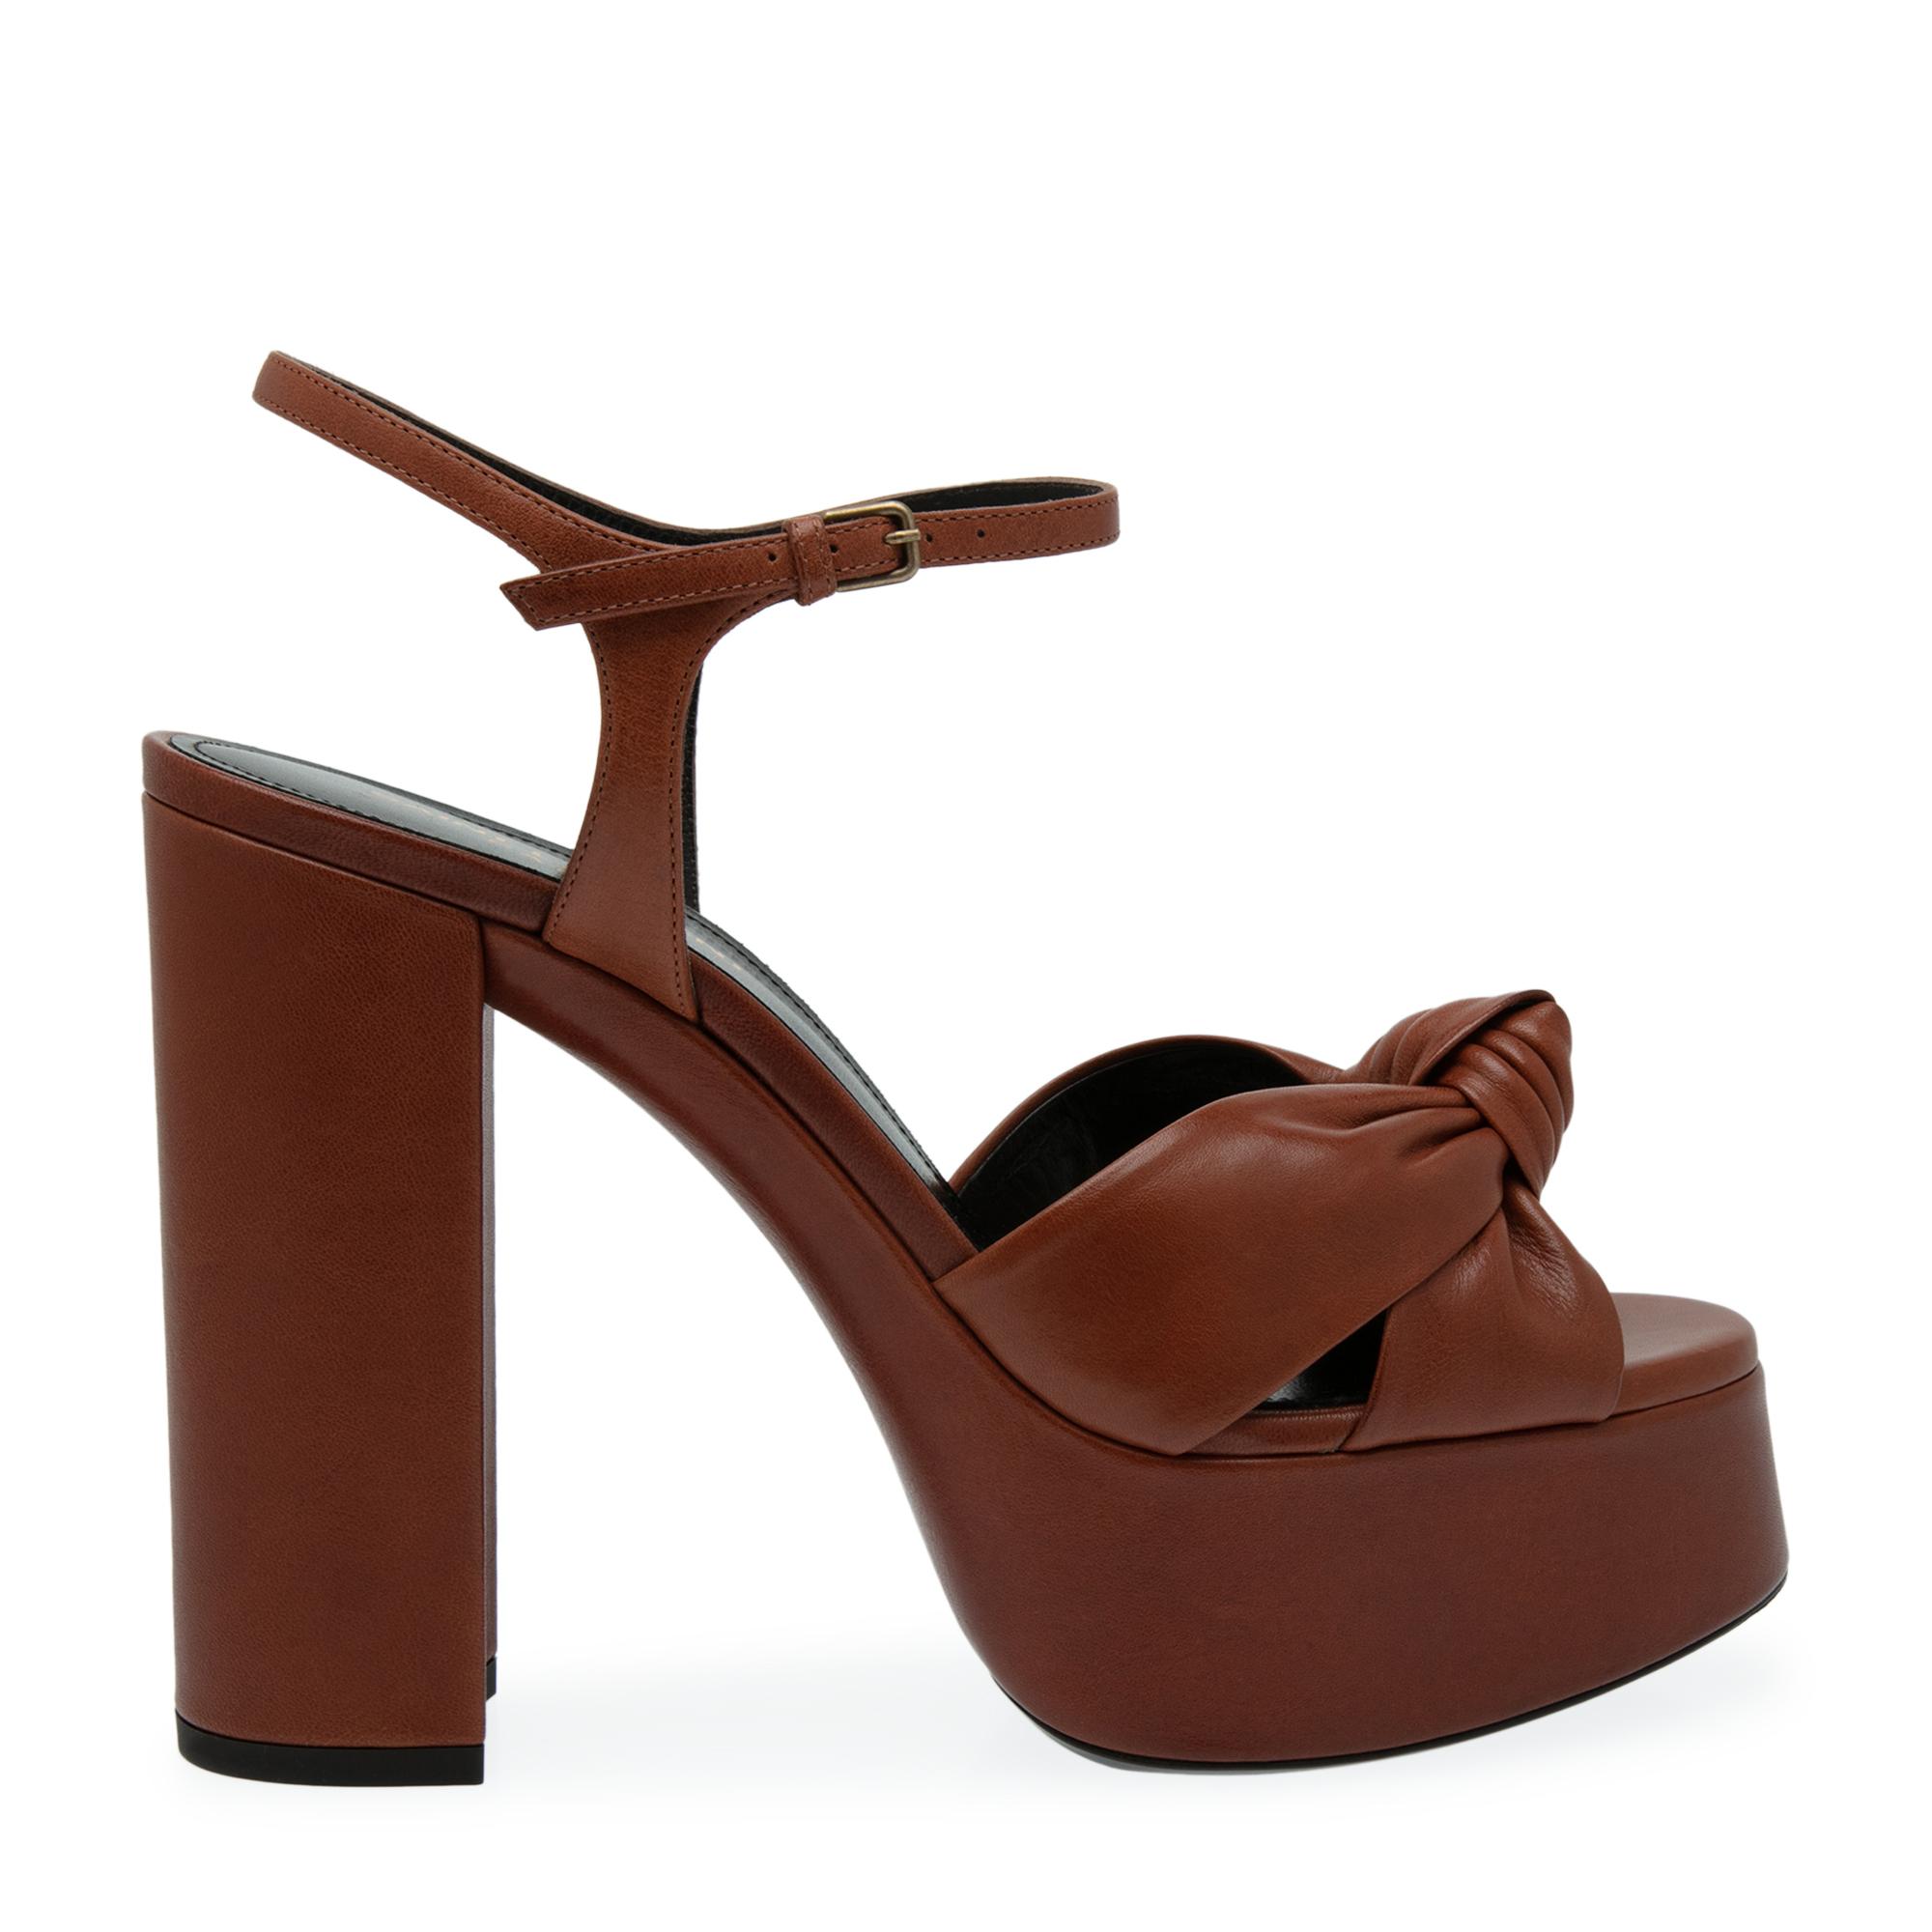 Bianca platform sandals